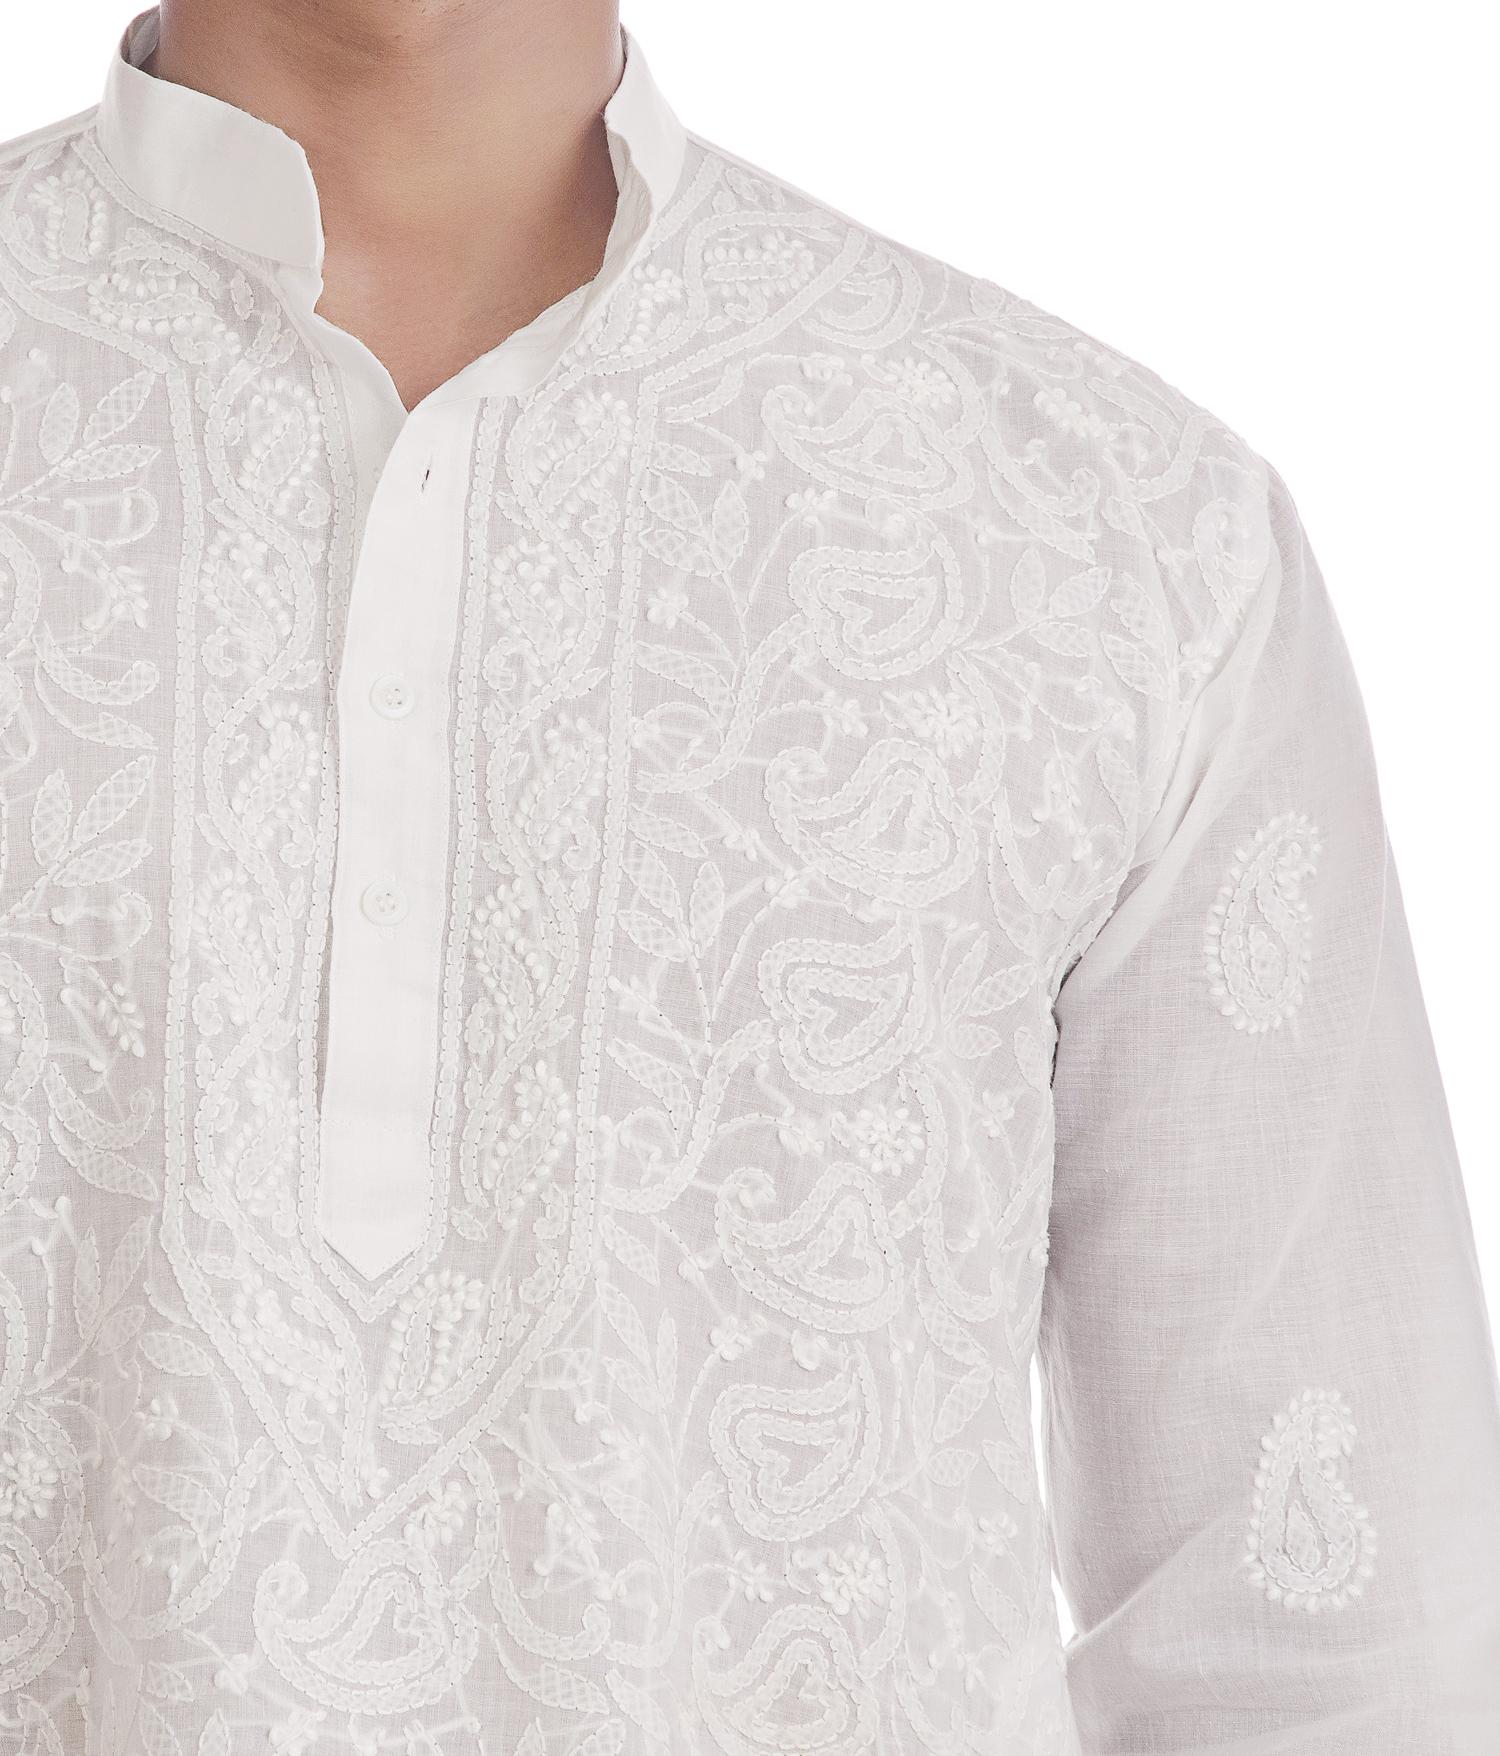 Ethnava White Front Full Jaal Work Hand Embroidered Mens Lucknowi Chikan Kurta